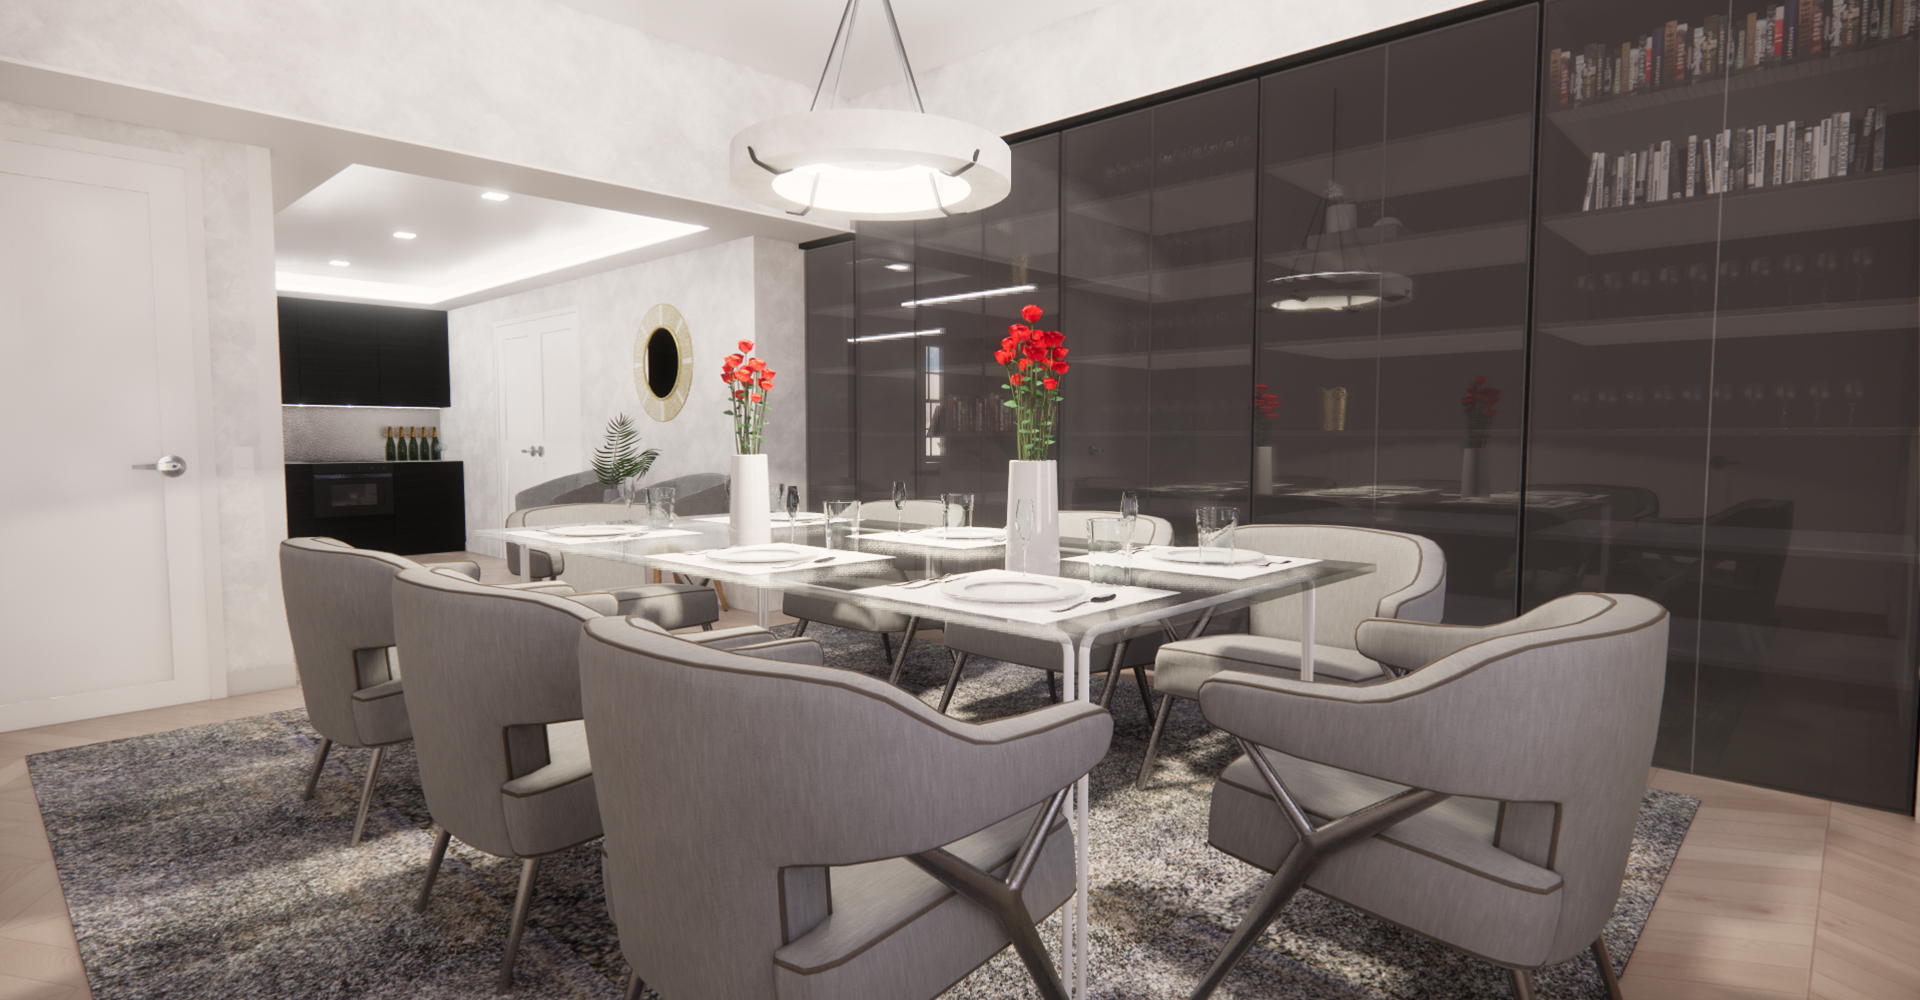 The Pierre, A Taj Hotel - Apartment Renovation